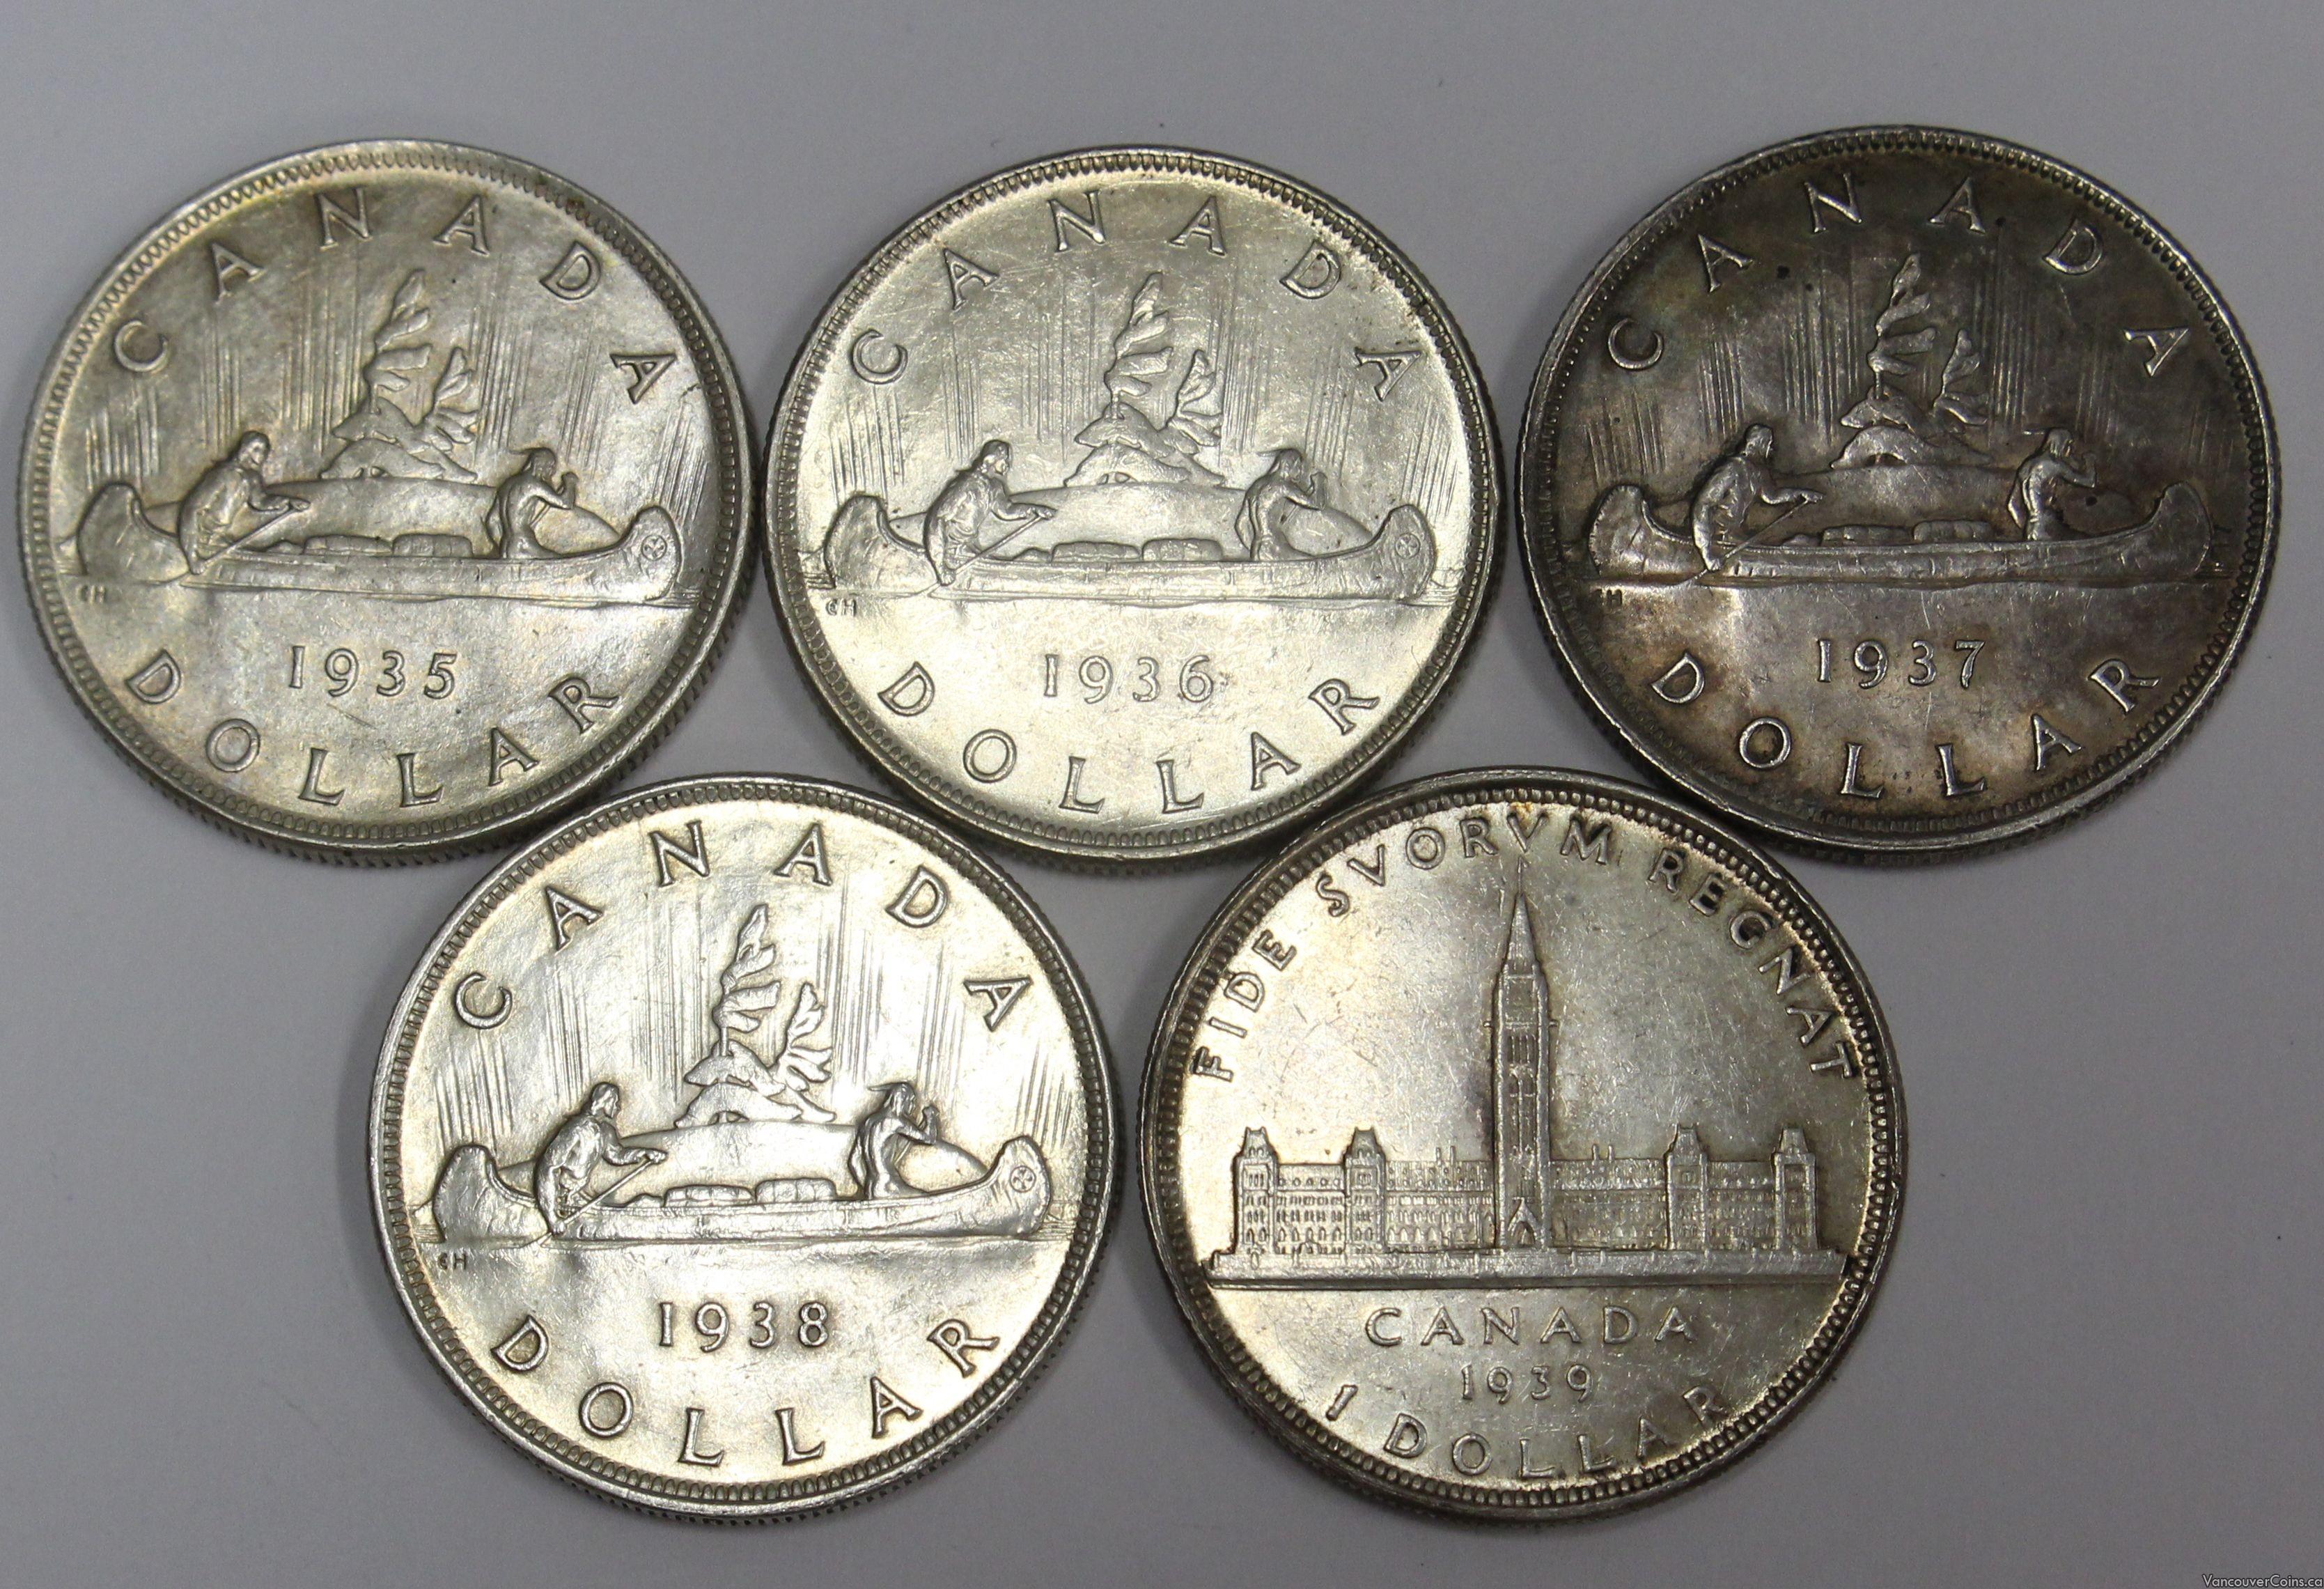 1935 1936 1937 1938 1939 Canadas first 5 silver dollars